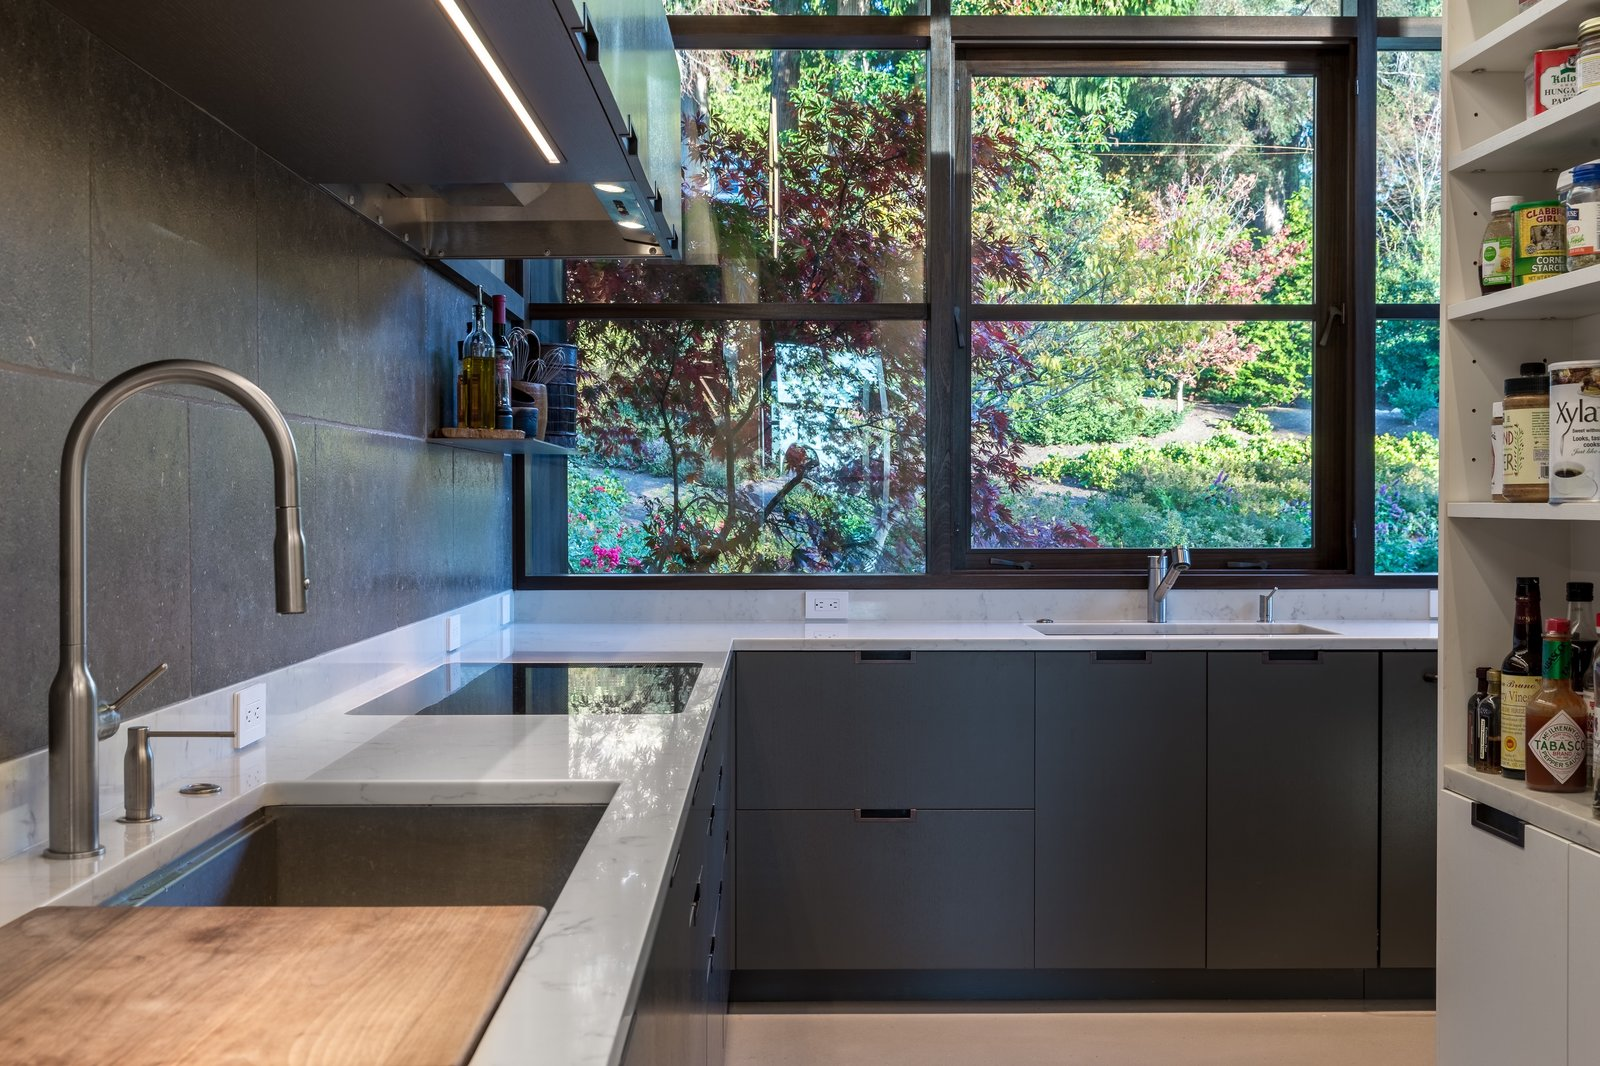 Kitchen, Quartzite, Range, Open, Stone Slab, Concrete, Metal, Drop In, and Recessed  Kitchen Concrete Metal Open Photos from Kayak Point